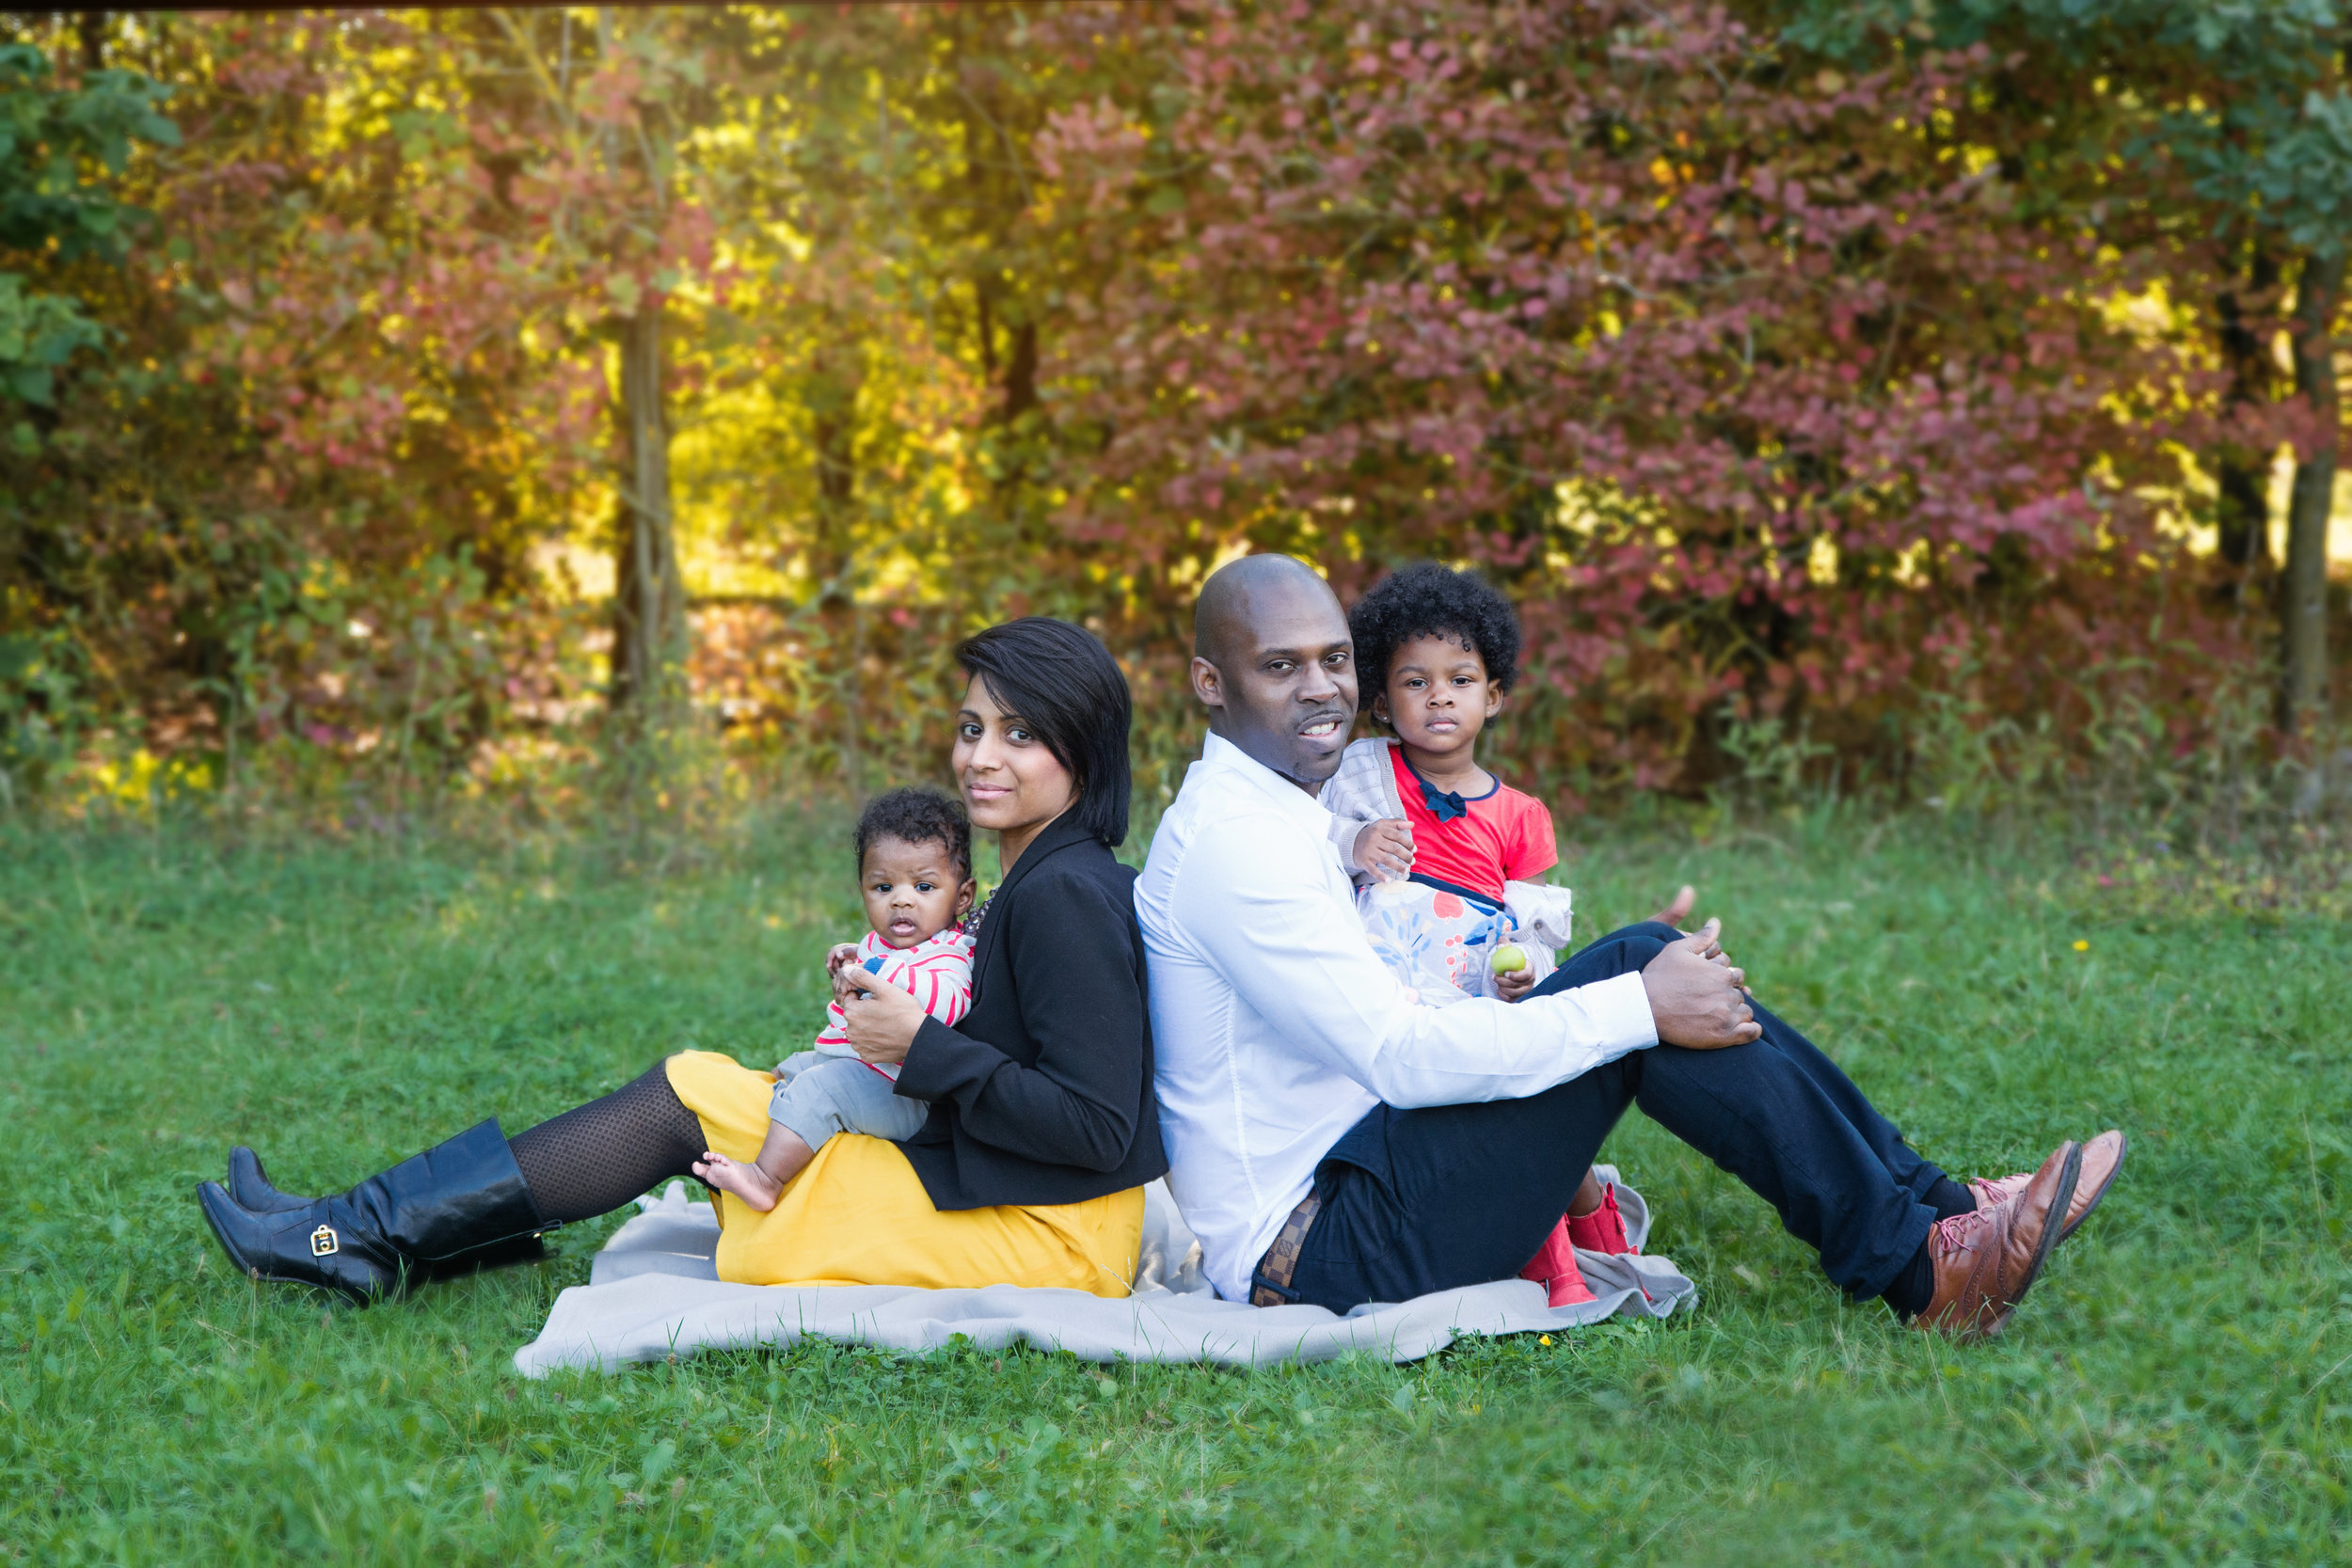 FEATURED MULTIRACIAL FAMILY: MEET THE BATAMBUZE FAMILY via Swirl Nation Blog